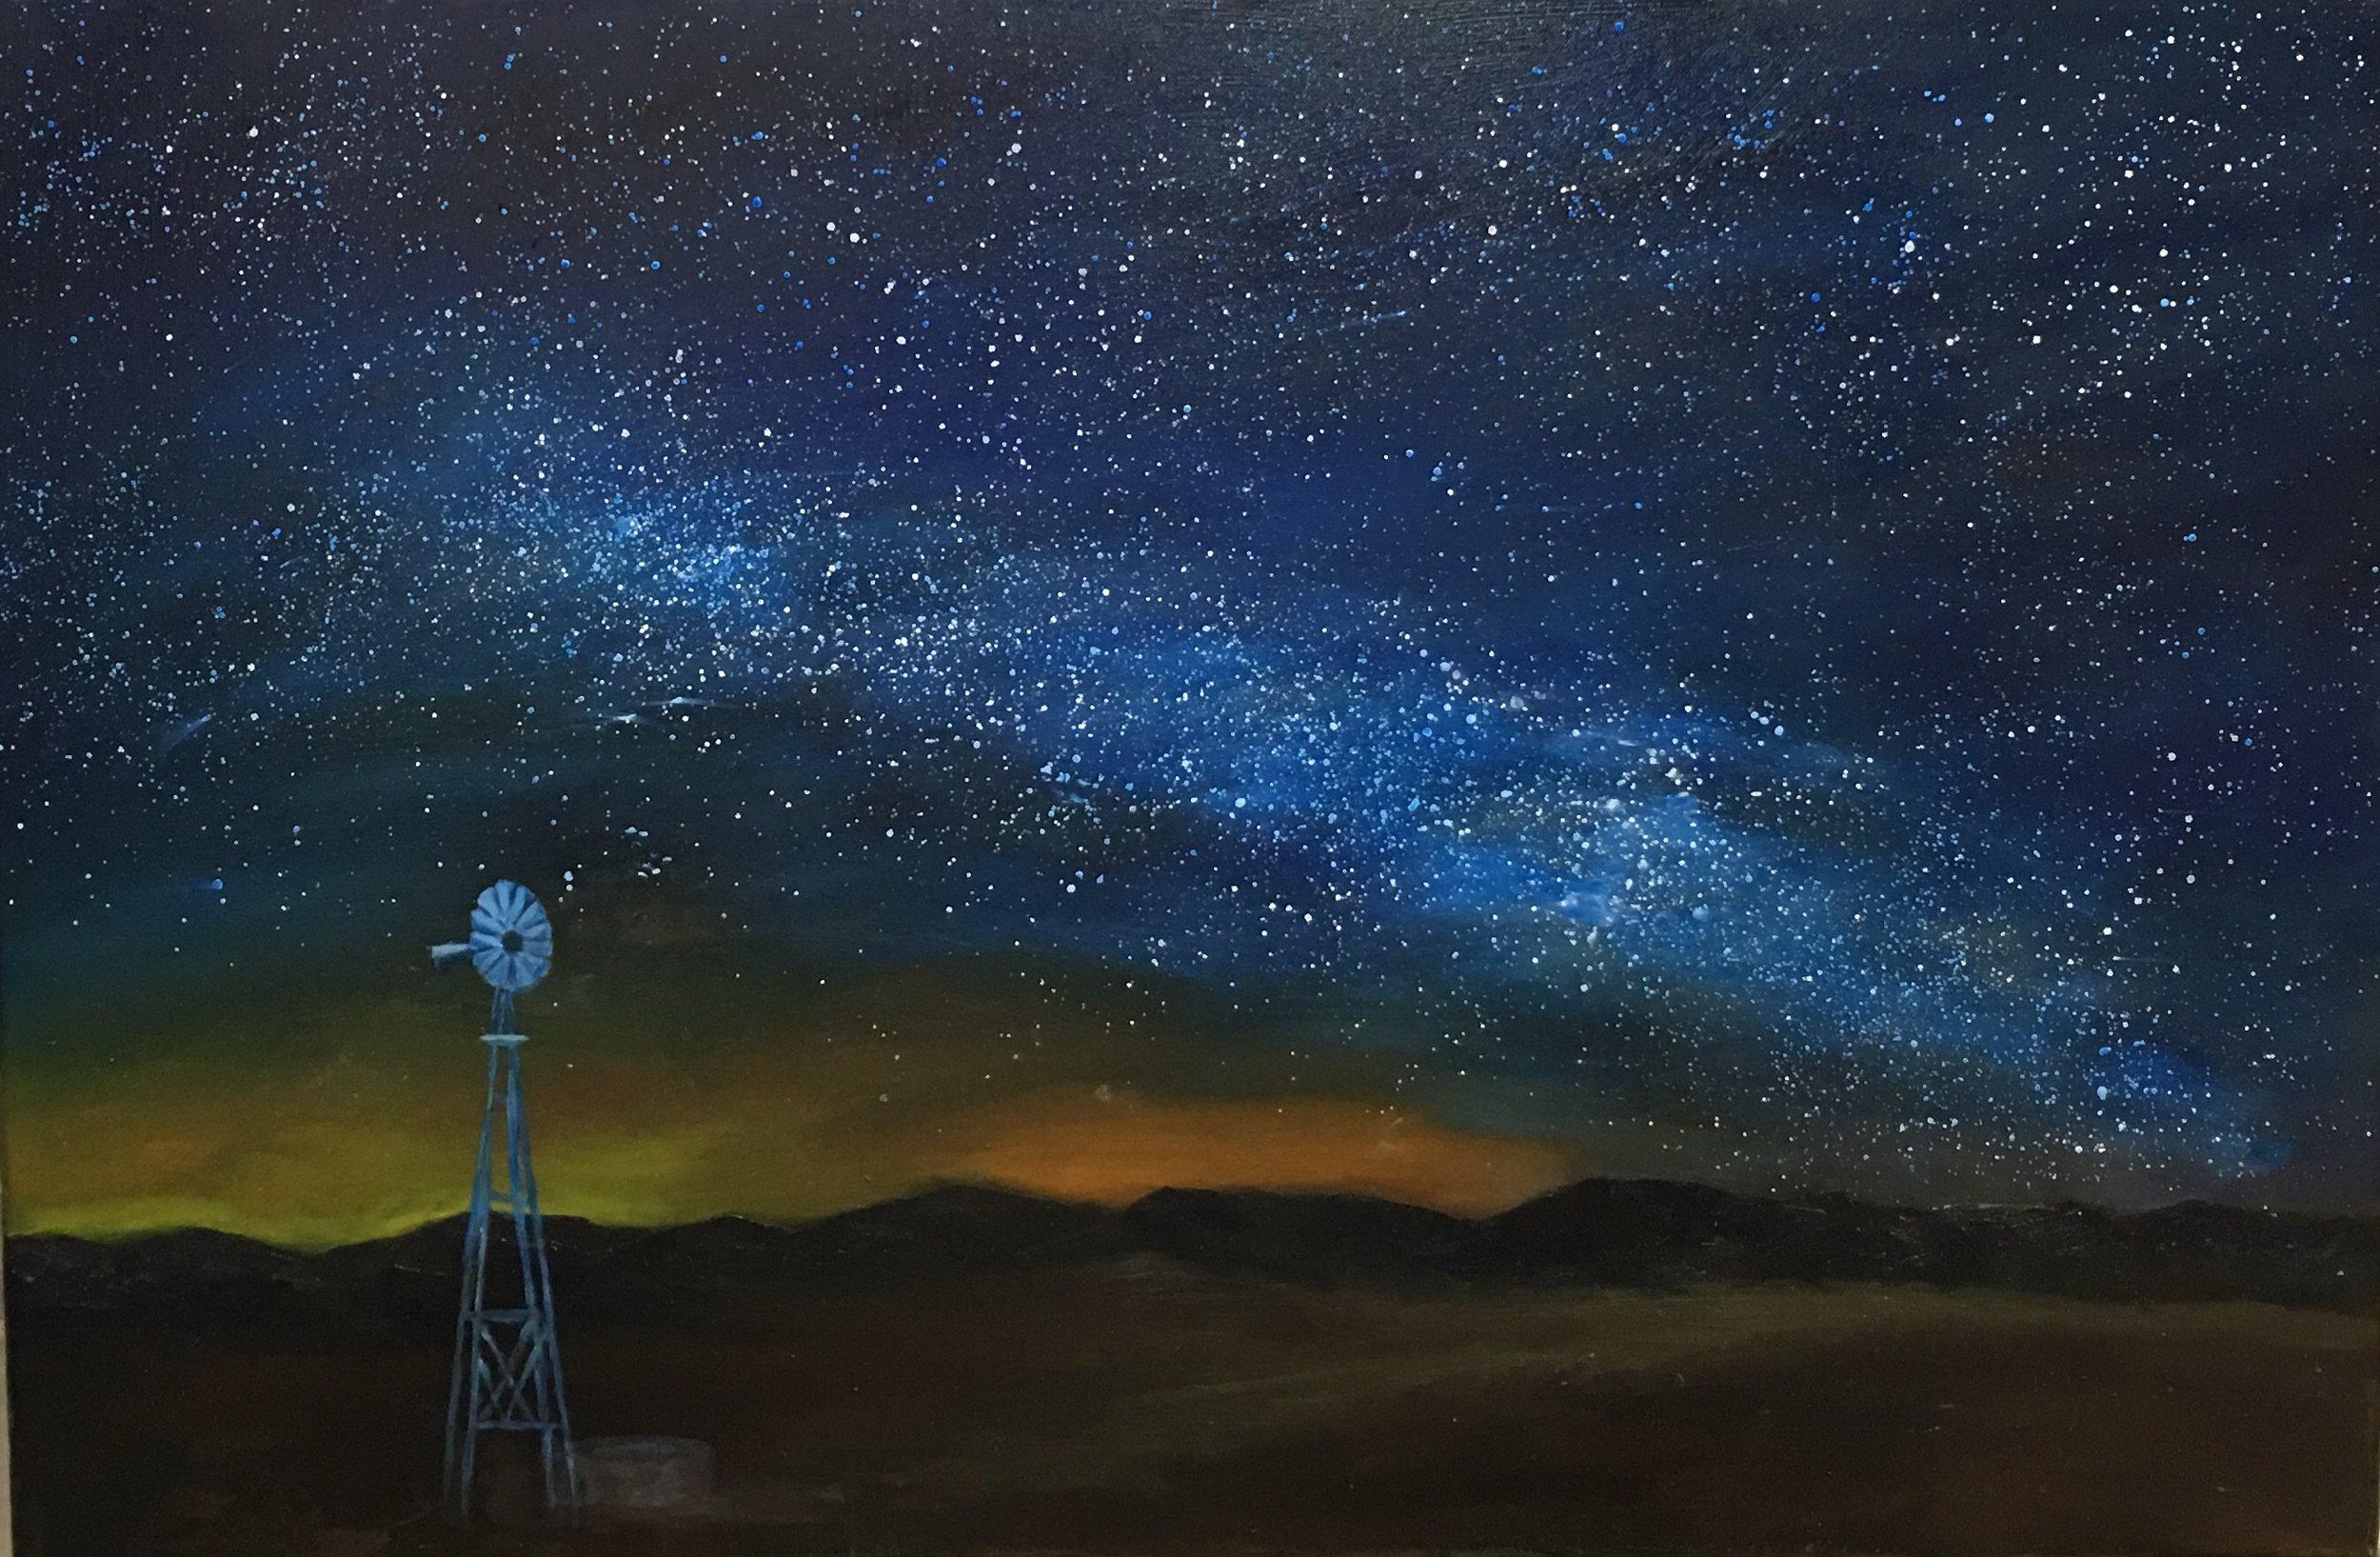 Marathon Nights  Oil on Canvas | 24x36 | 2018 |  SOLD